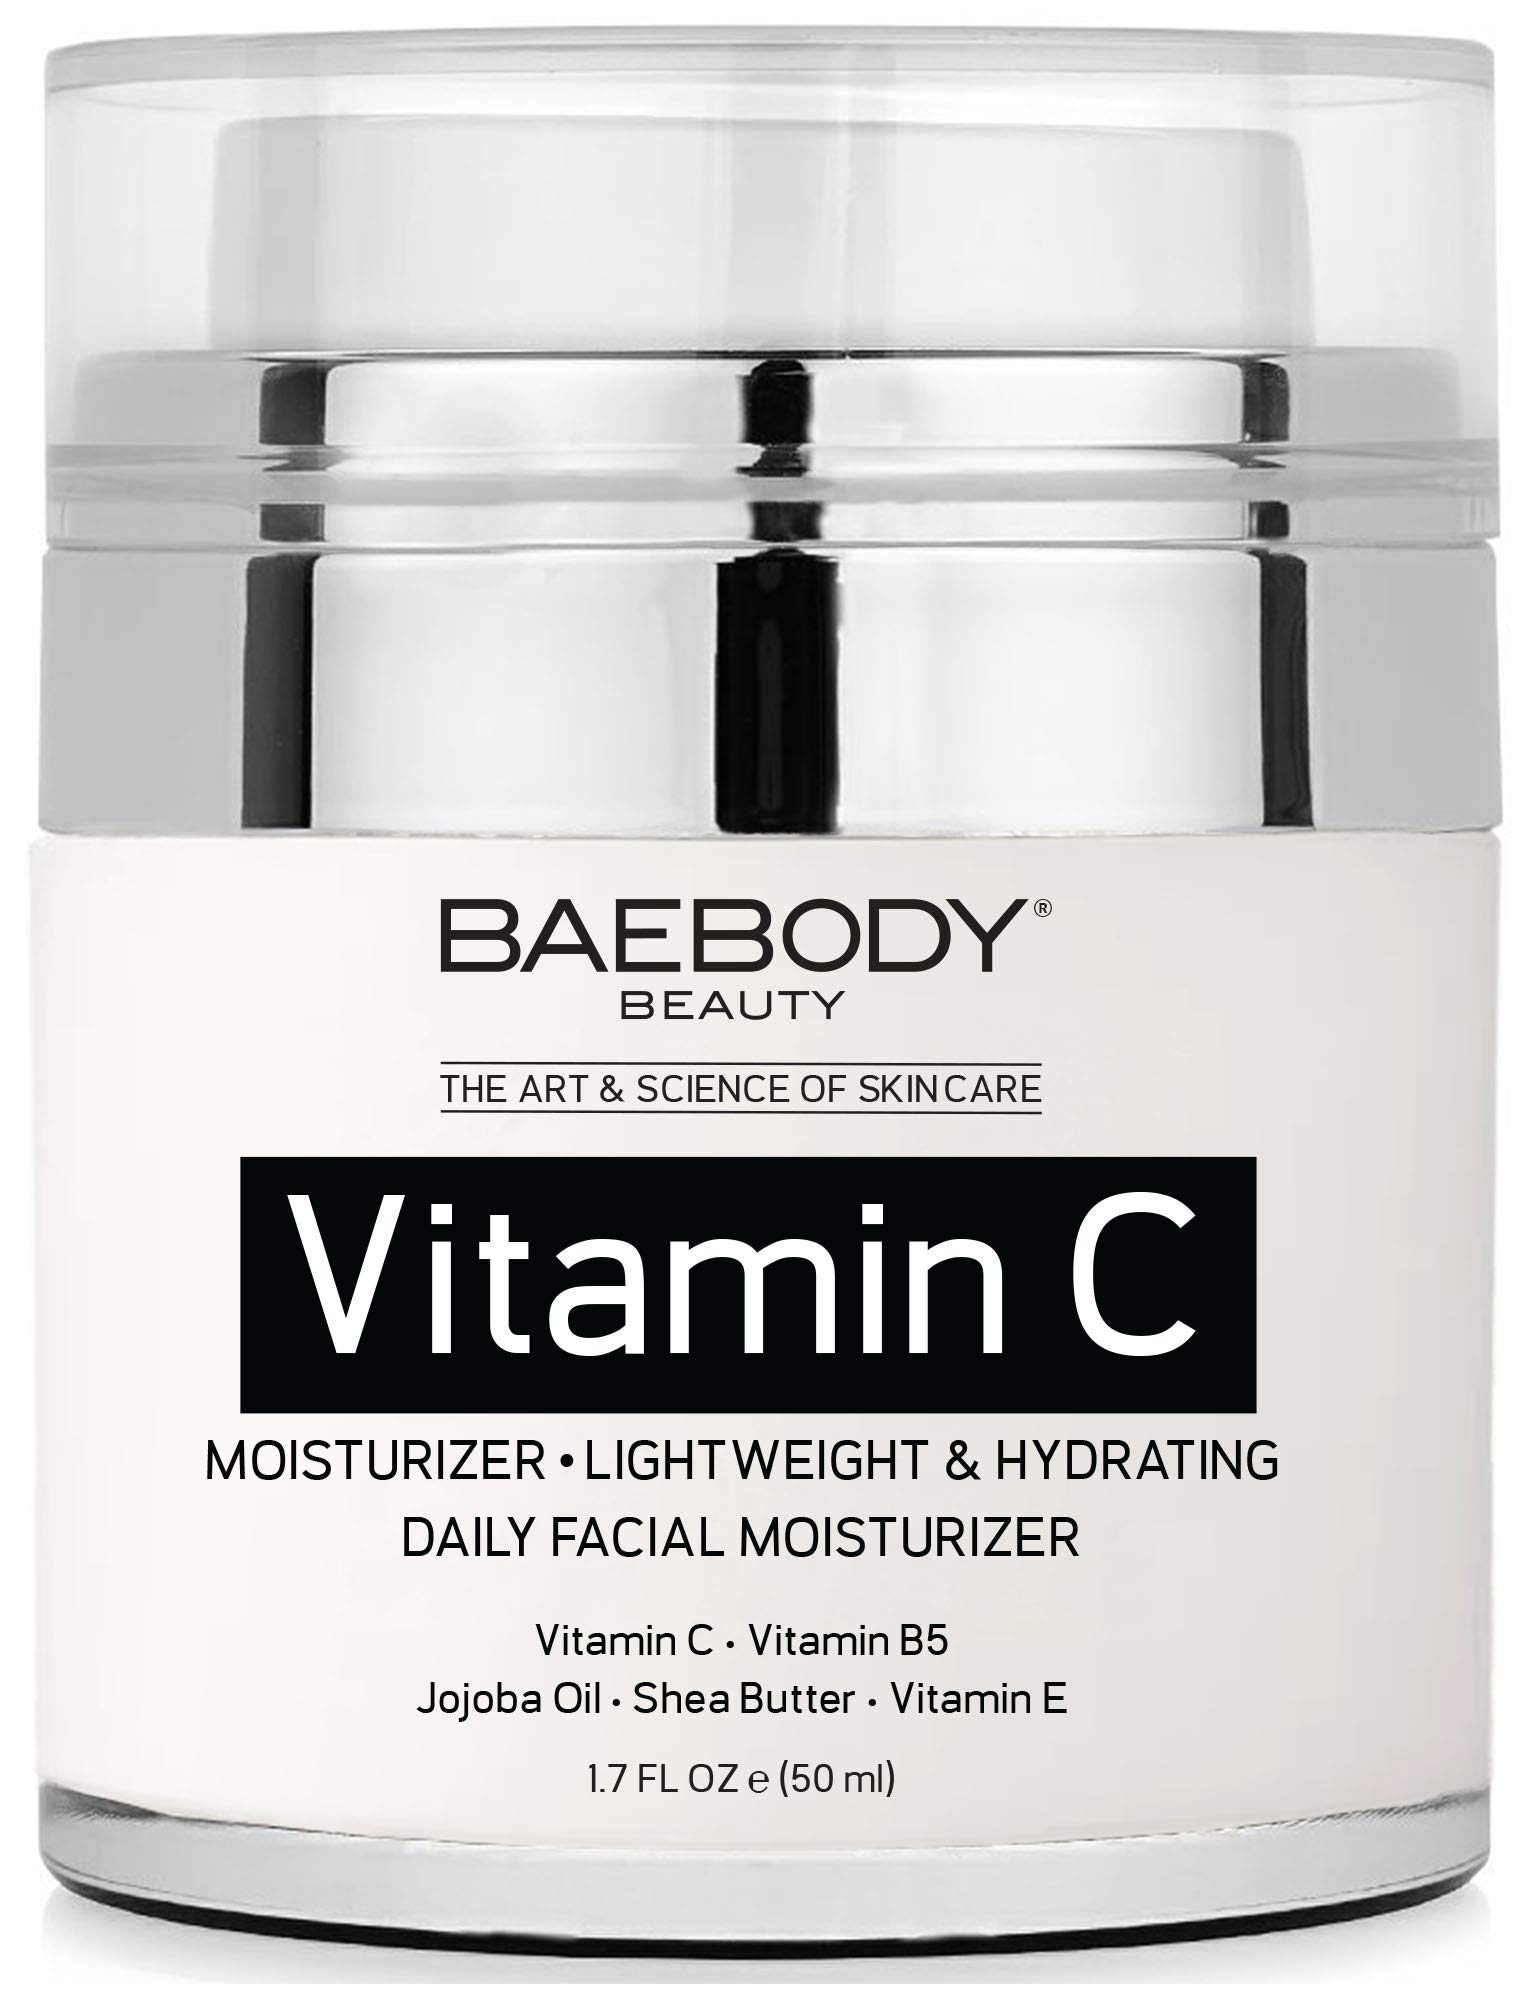 Baebody Vitamin C Moisturizer Cream with Vitamin C, Jojoba Oil & Vitamin E, 1.7 Ounces